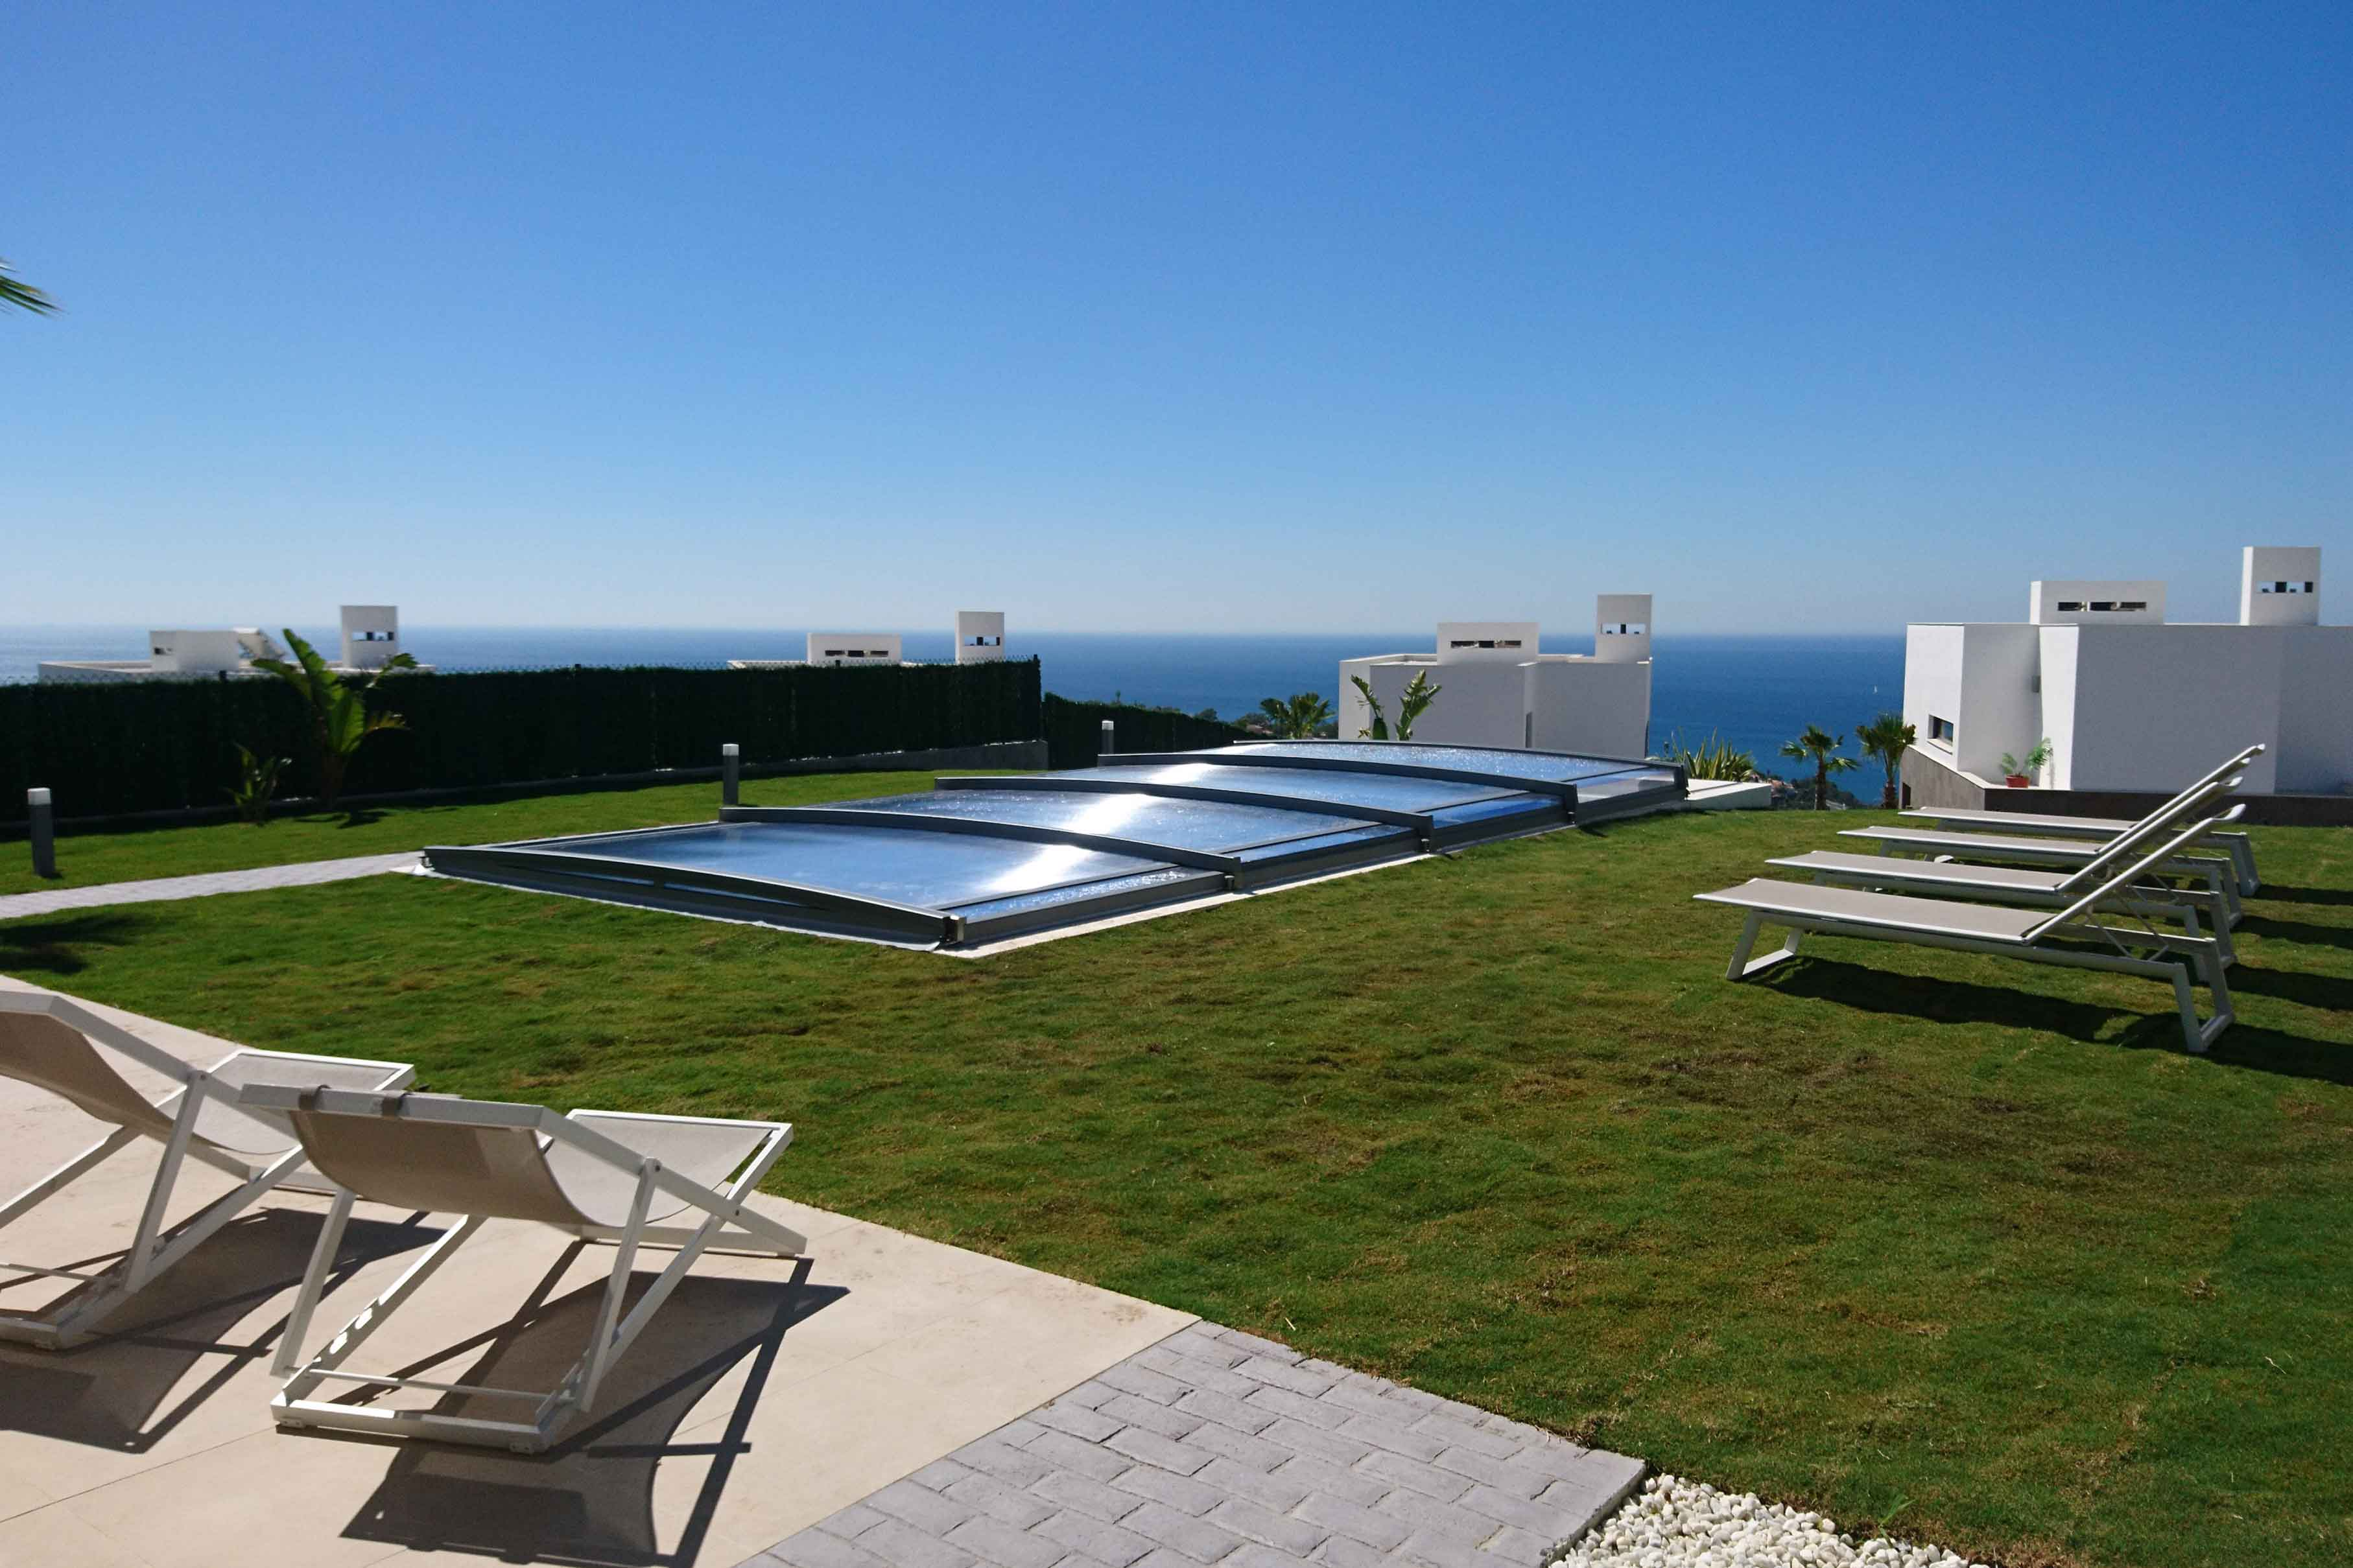 cubierta de piscina telescopica ultra baja Neo Smart Azenco